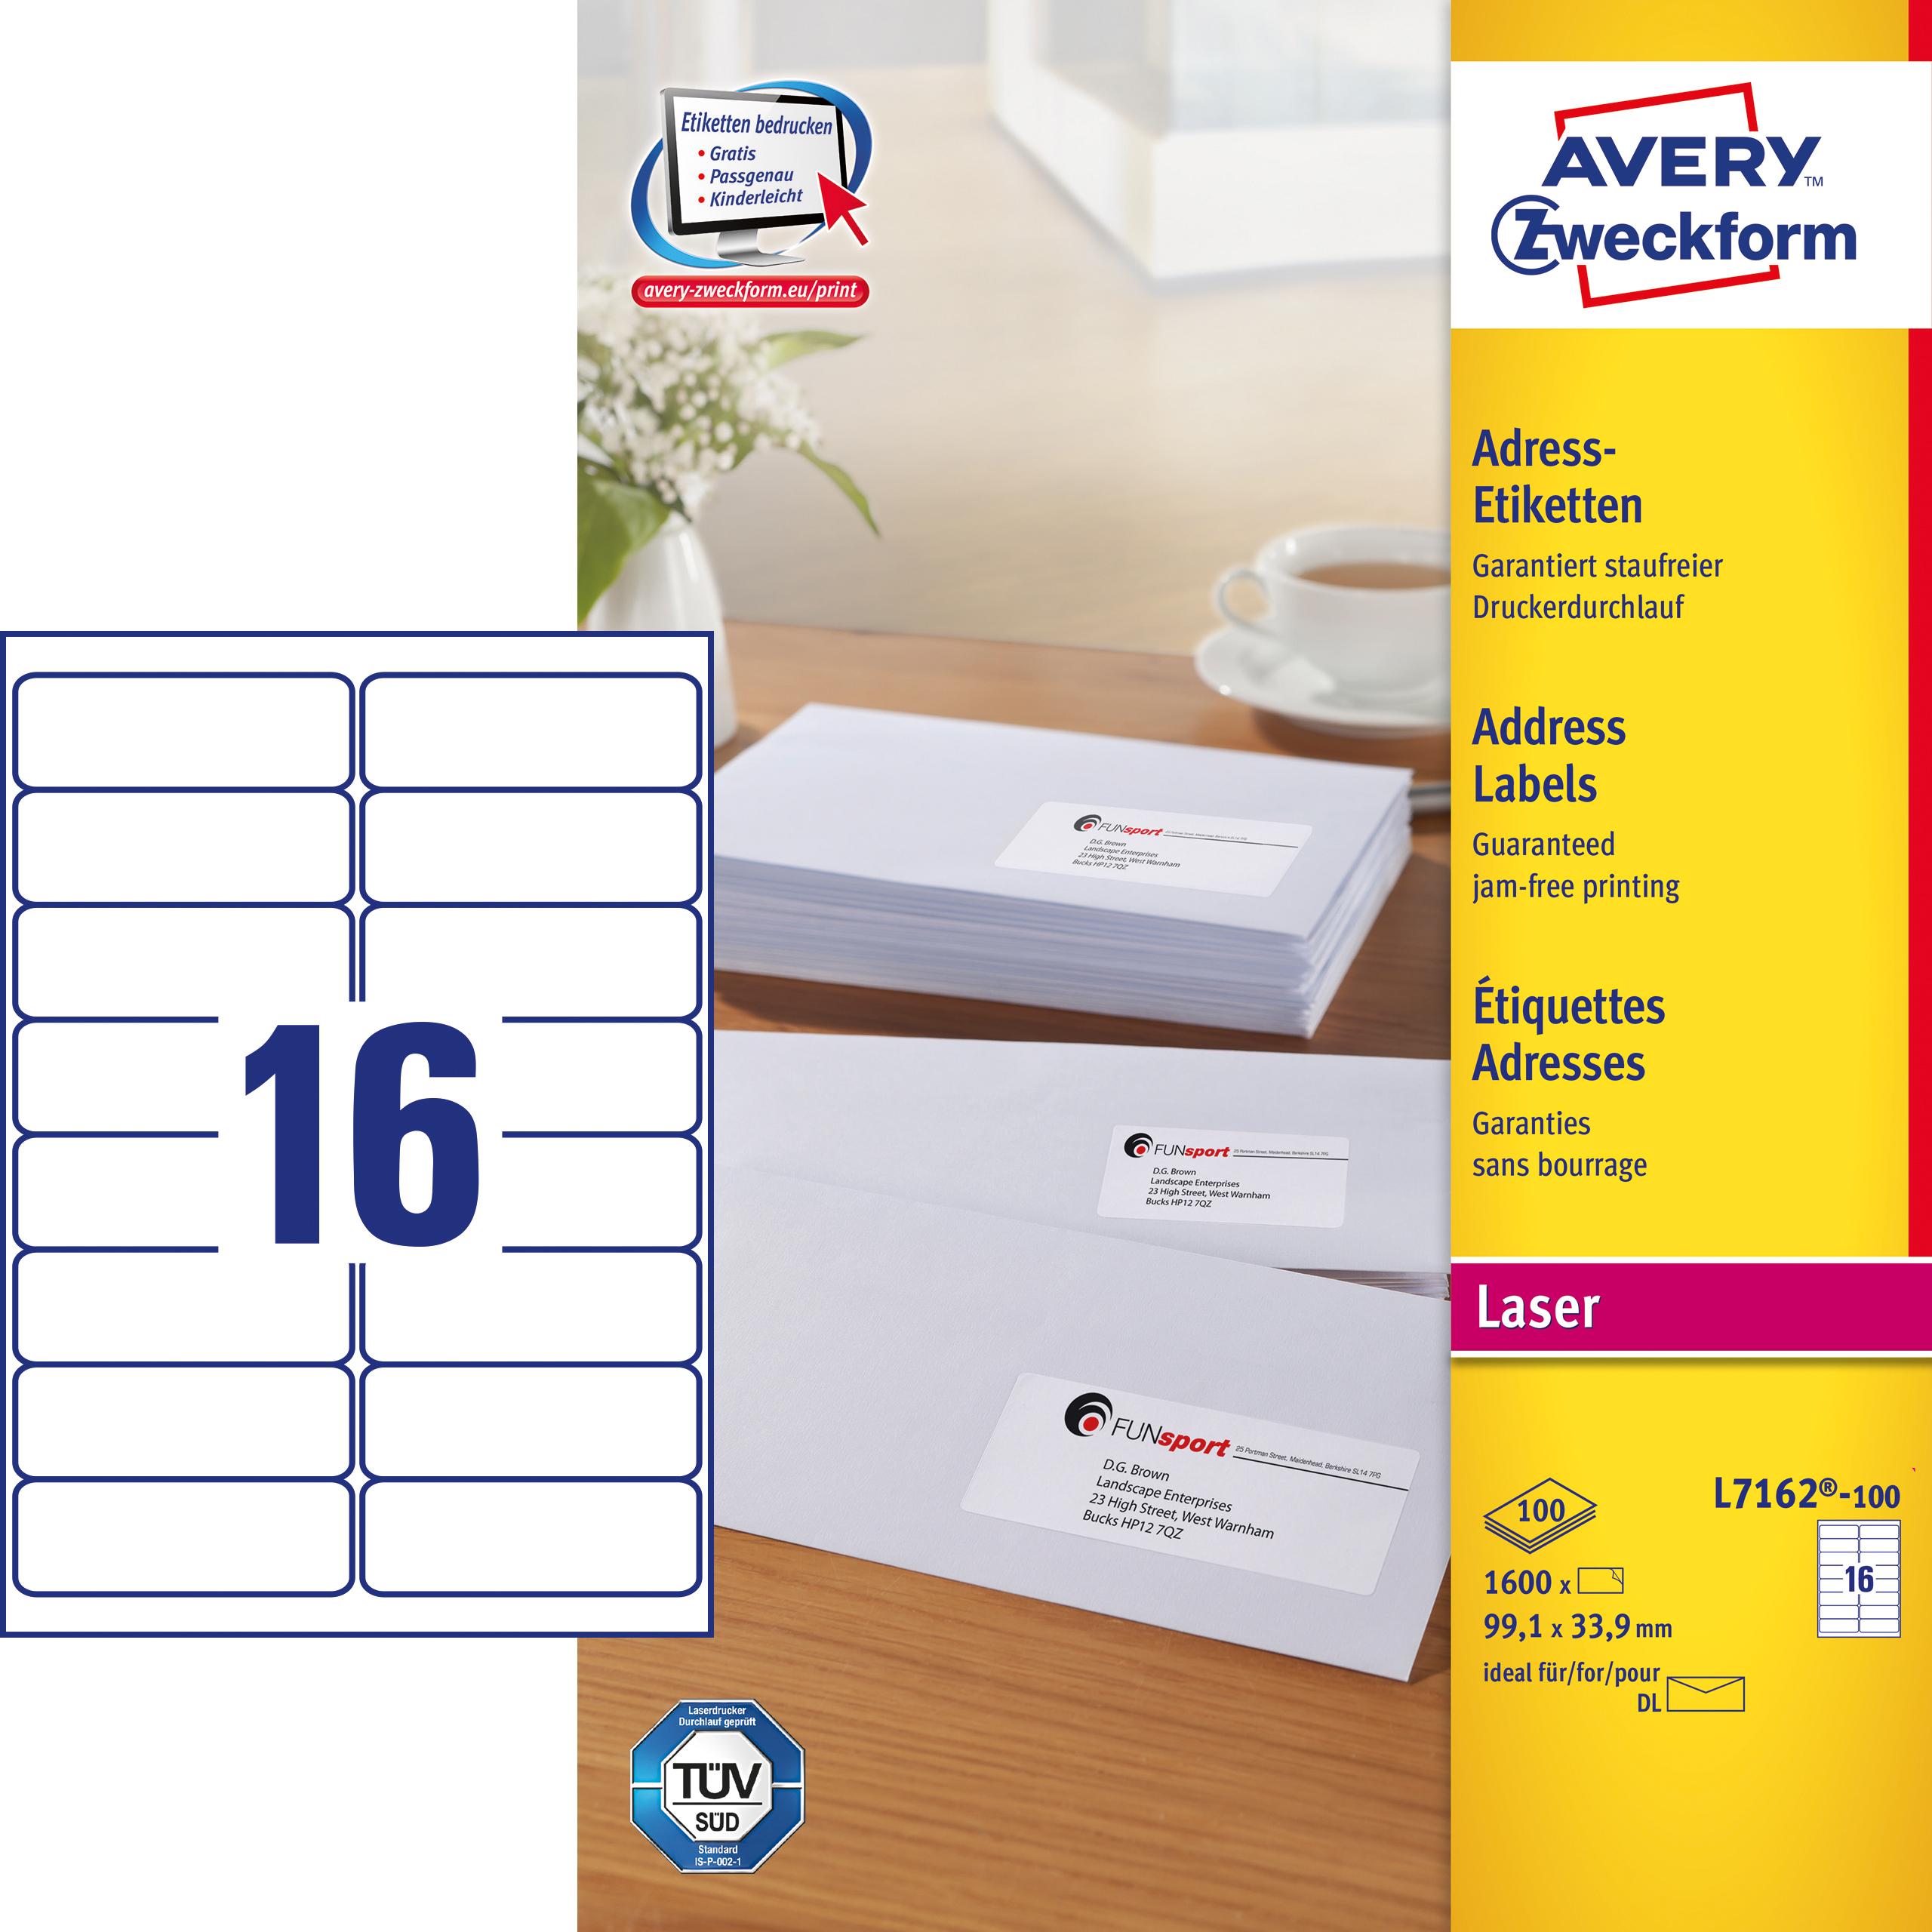 Image of Avery adresseetiket 99,1x33,9mm QP (1600)